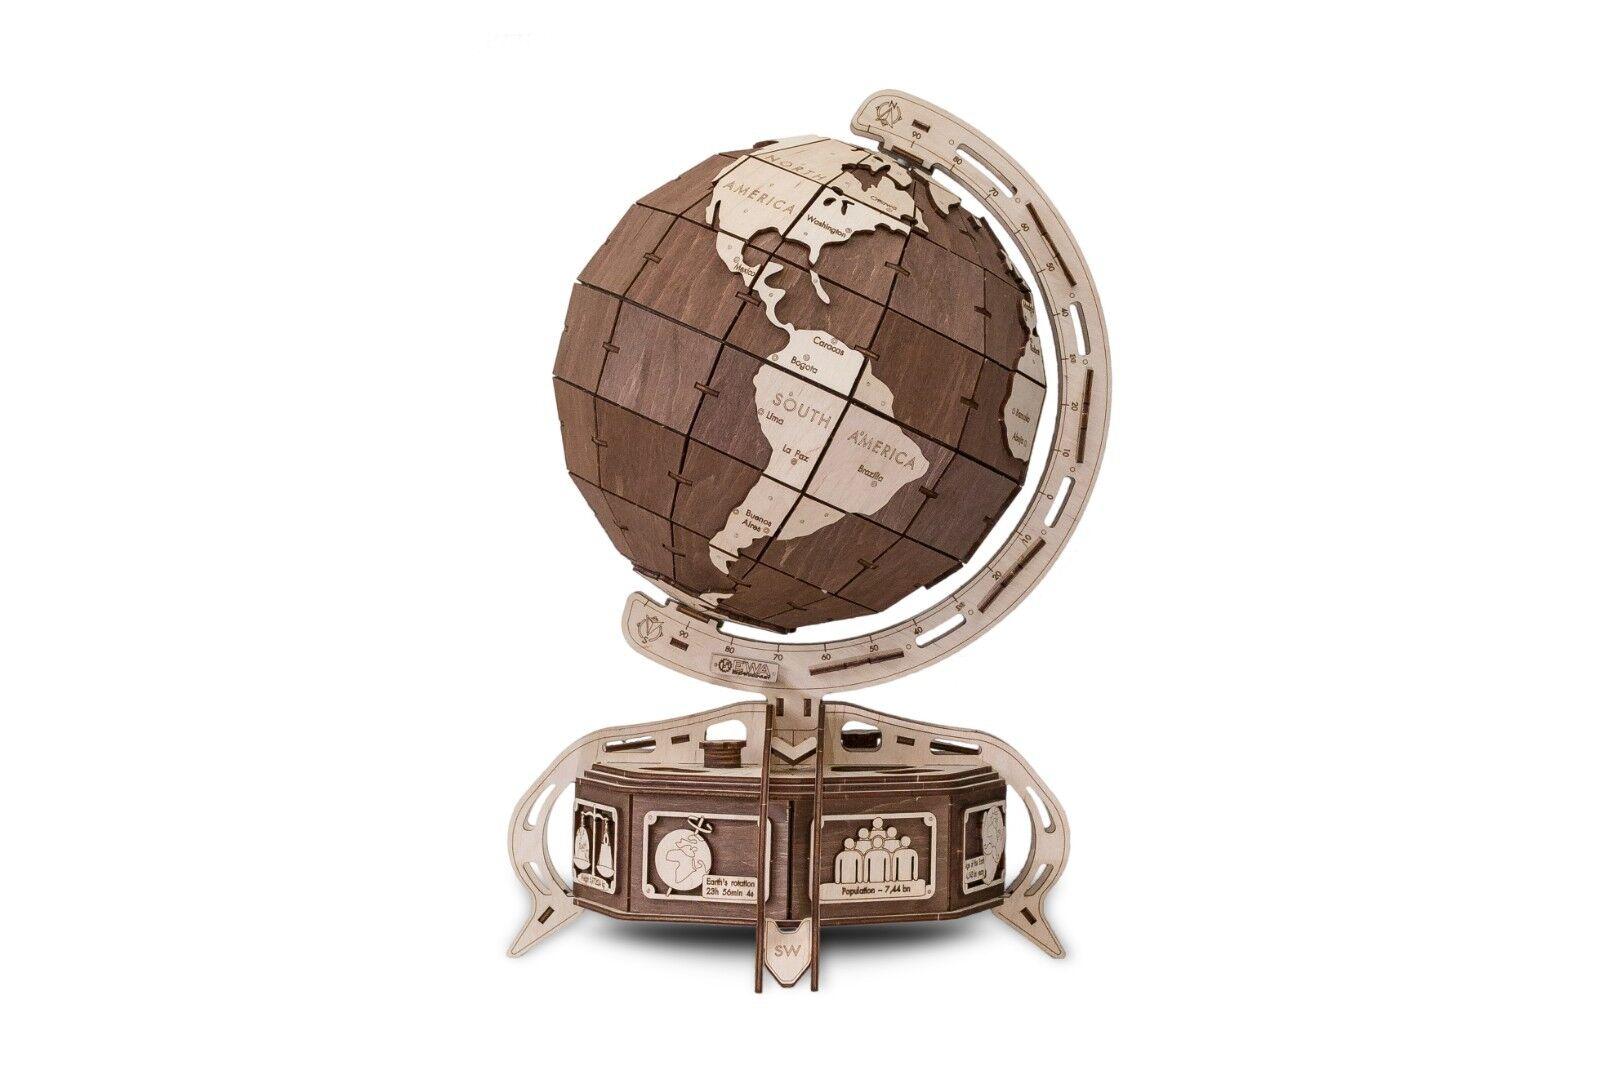 EWA Eco-Wood-Art Model Globe  marrone  3D Wooden Puzzle DIY Mechanical with Secret